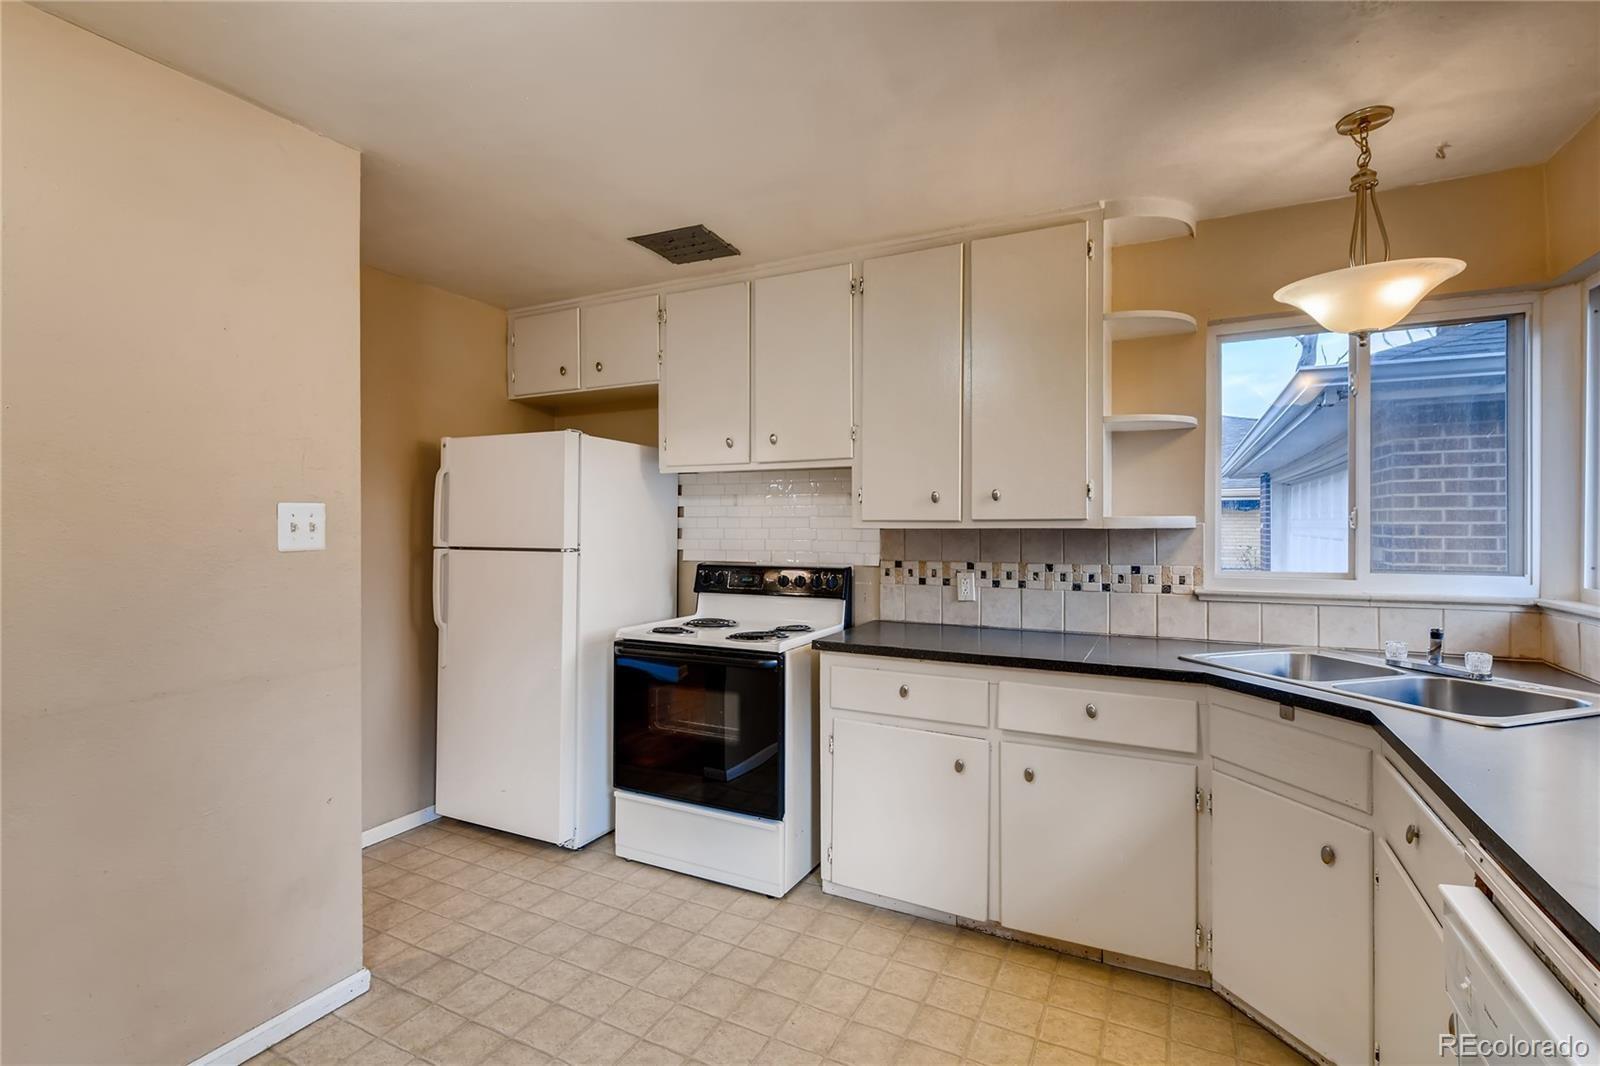 MLS# 2644155 - 9 - 3840 Ingalls Street, Wheat Ridge, CO 80033